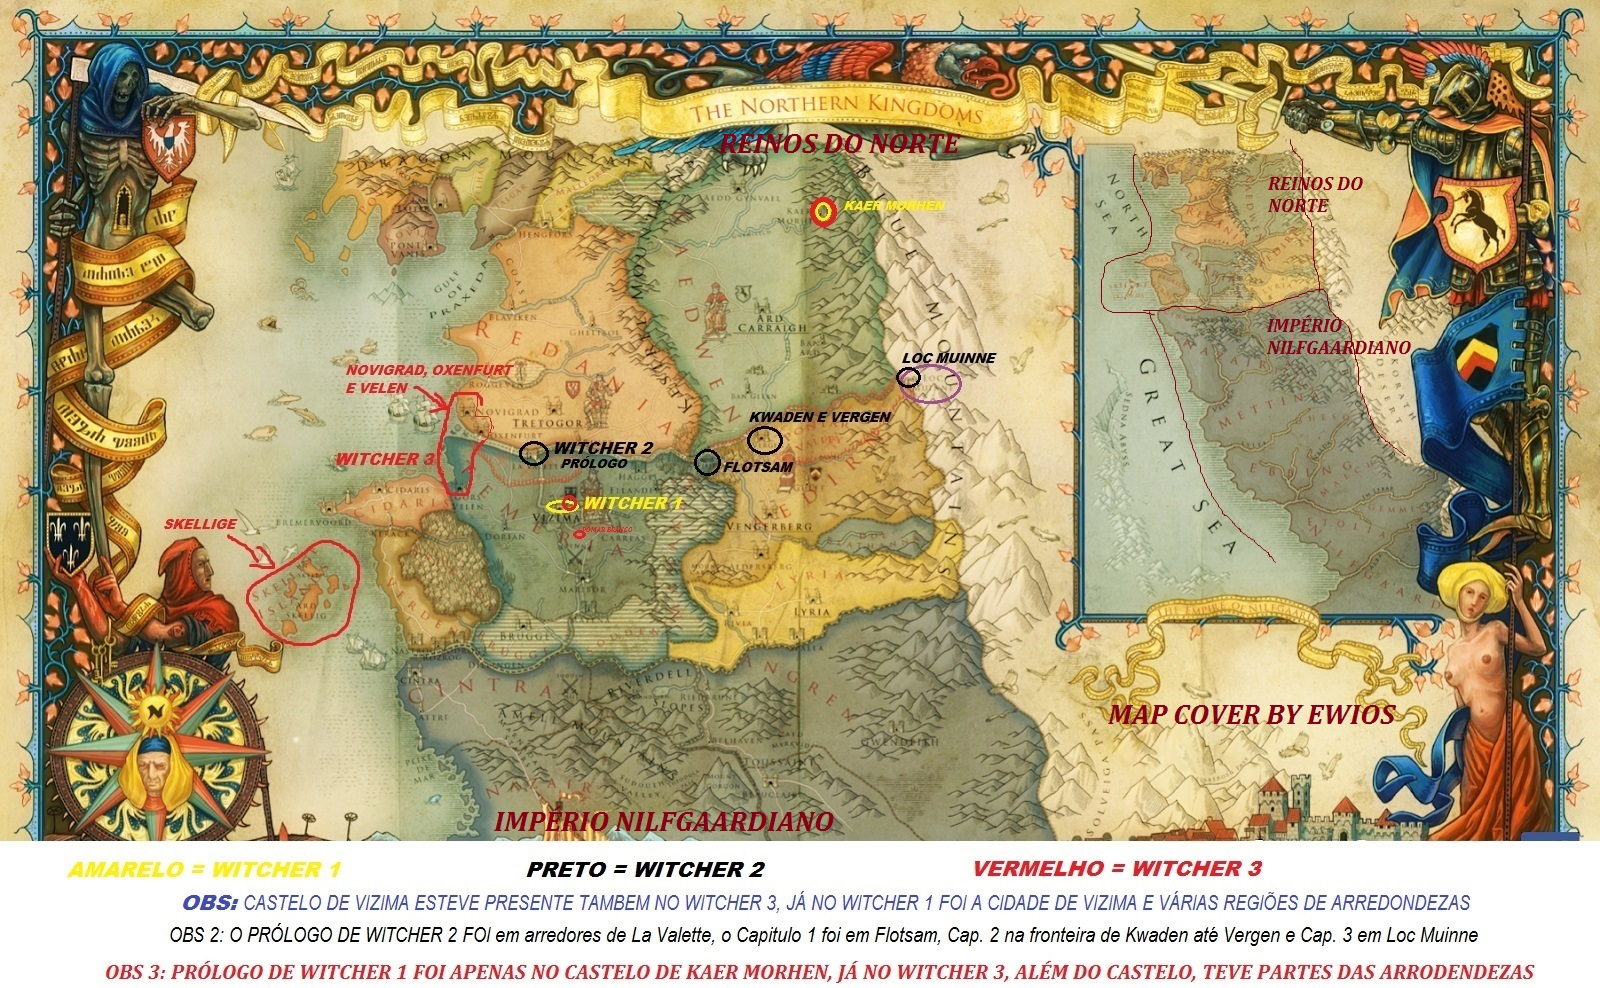 Mapa The Witcher 2.Cd Projekt Red Fans A Geografia Da Saga The Witcher Mapa